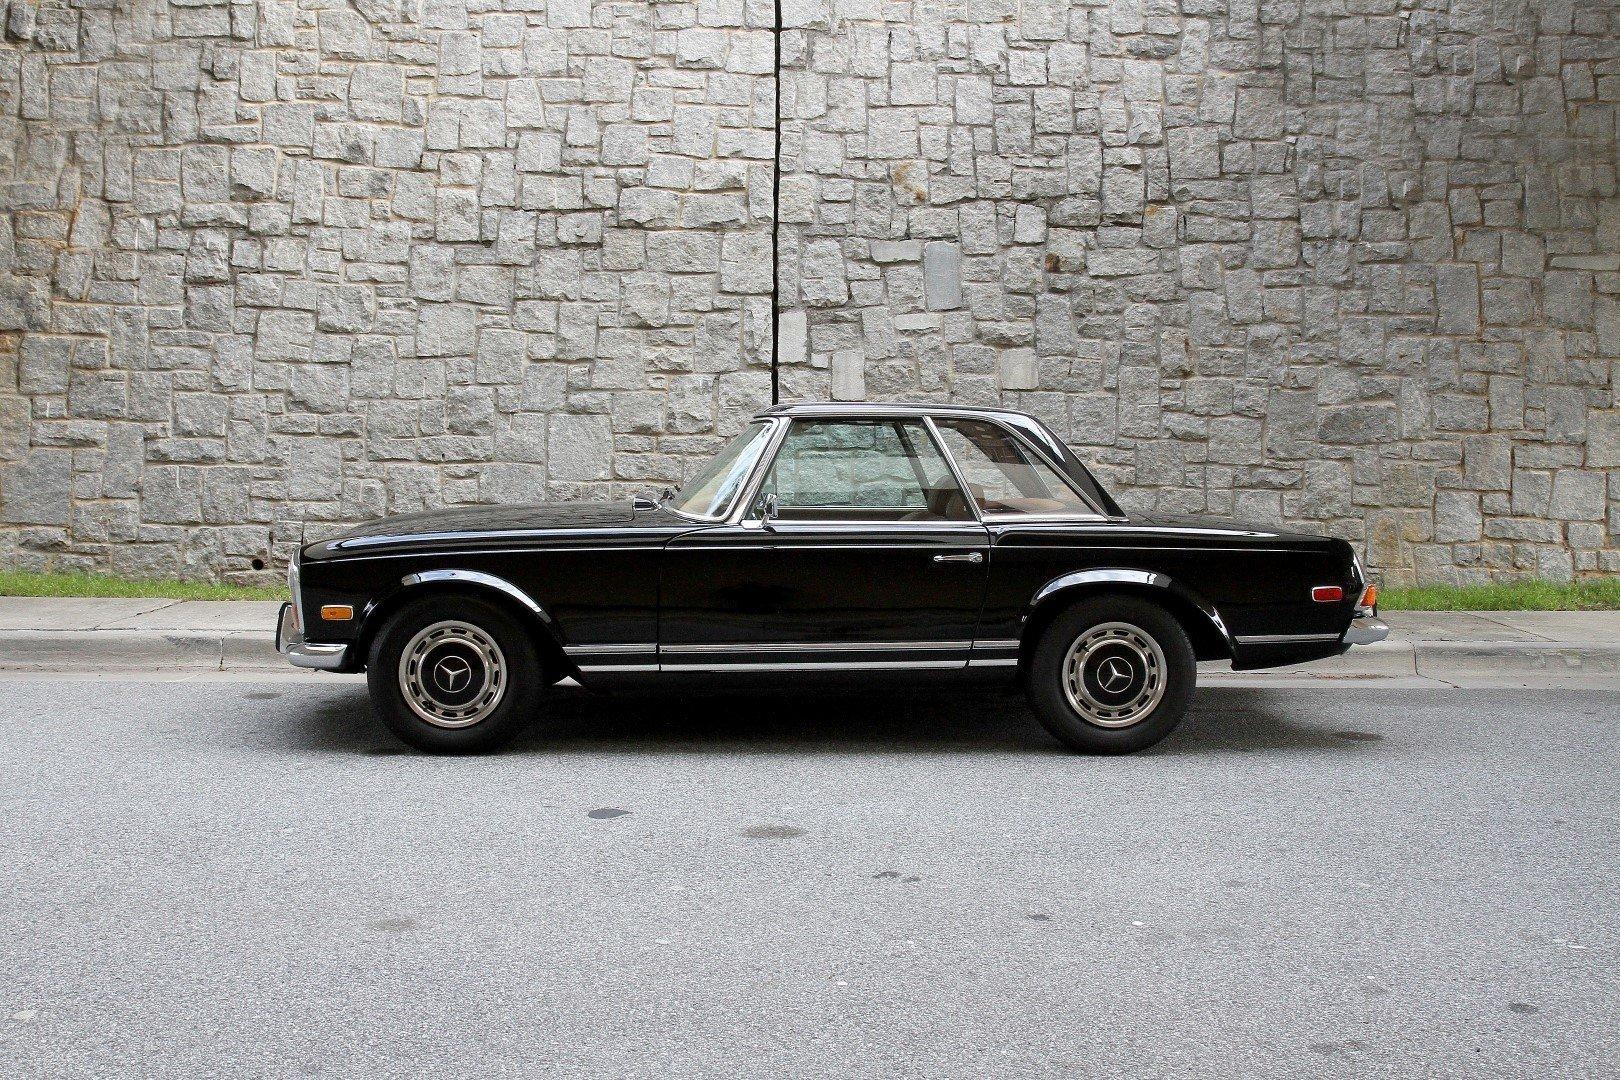 1971 mercedes benz 280sl for sale 79965 mcg for Mercedes garage 93